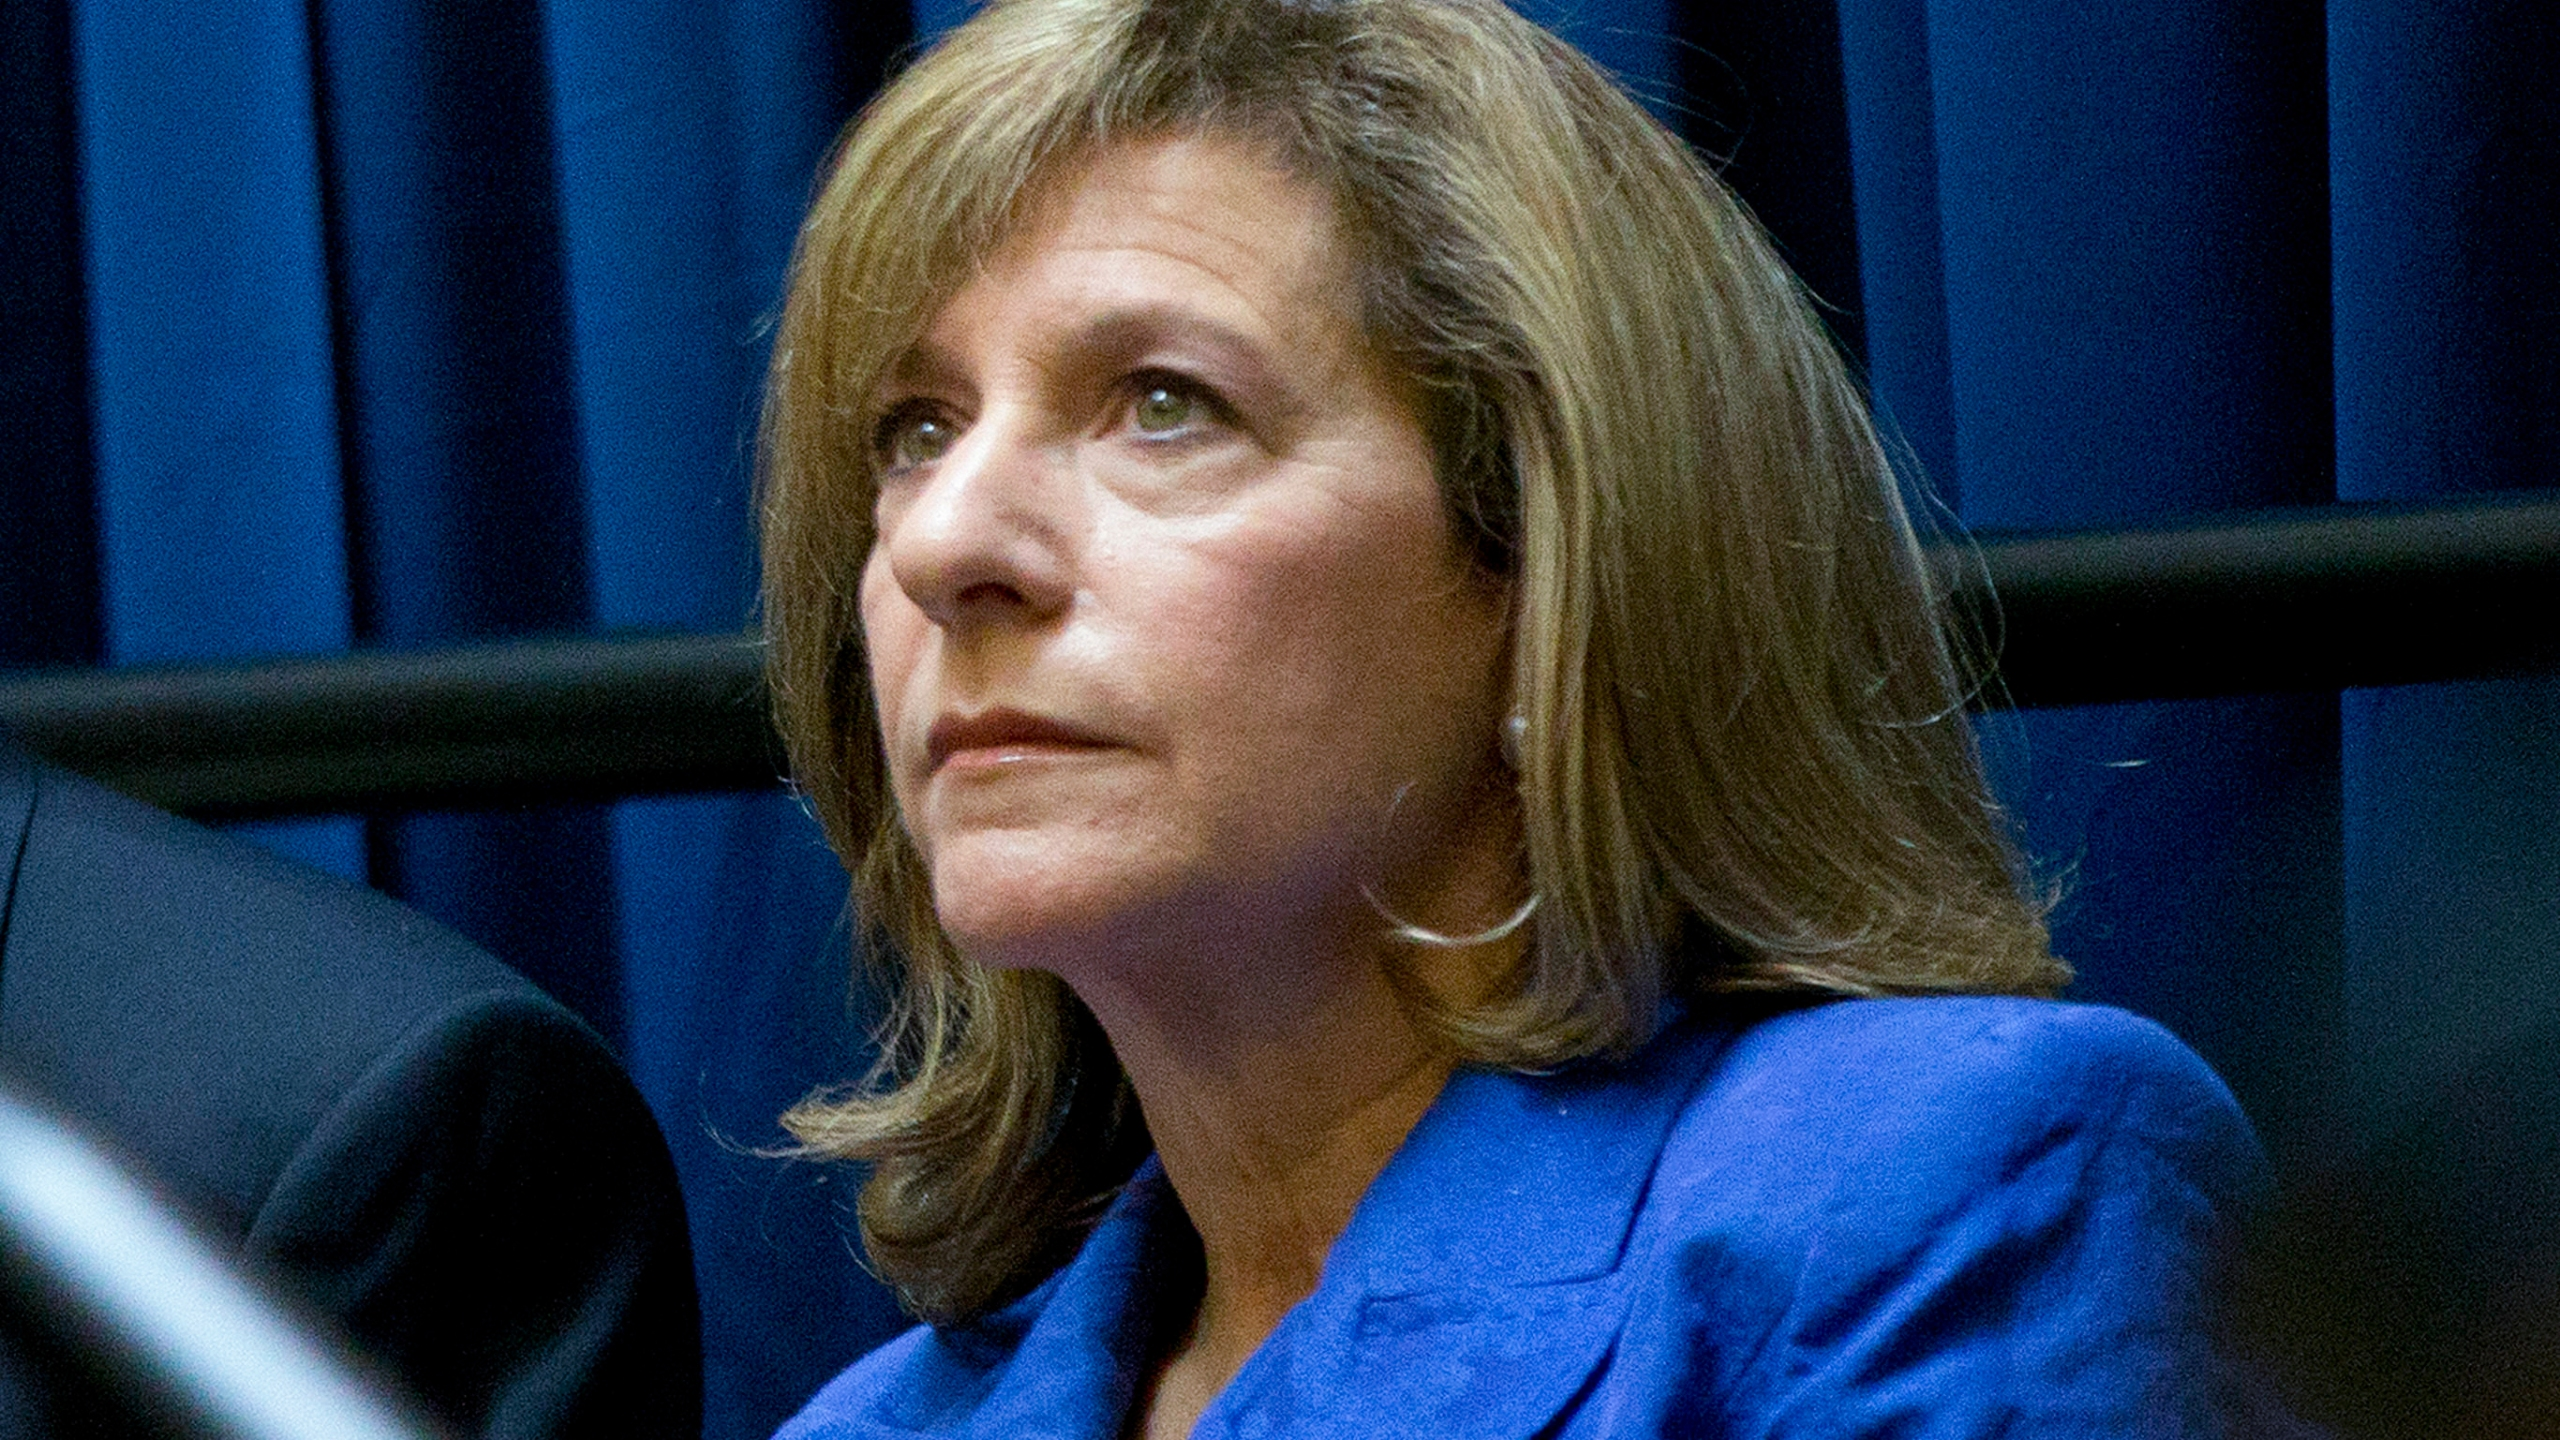 Amy Berman Jackson